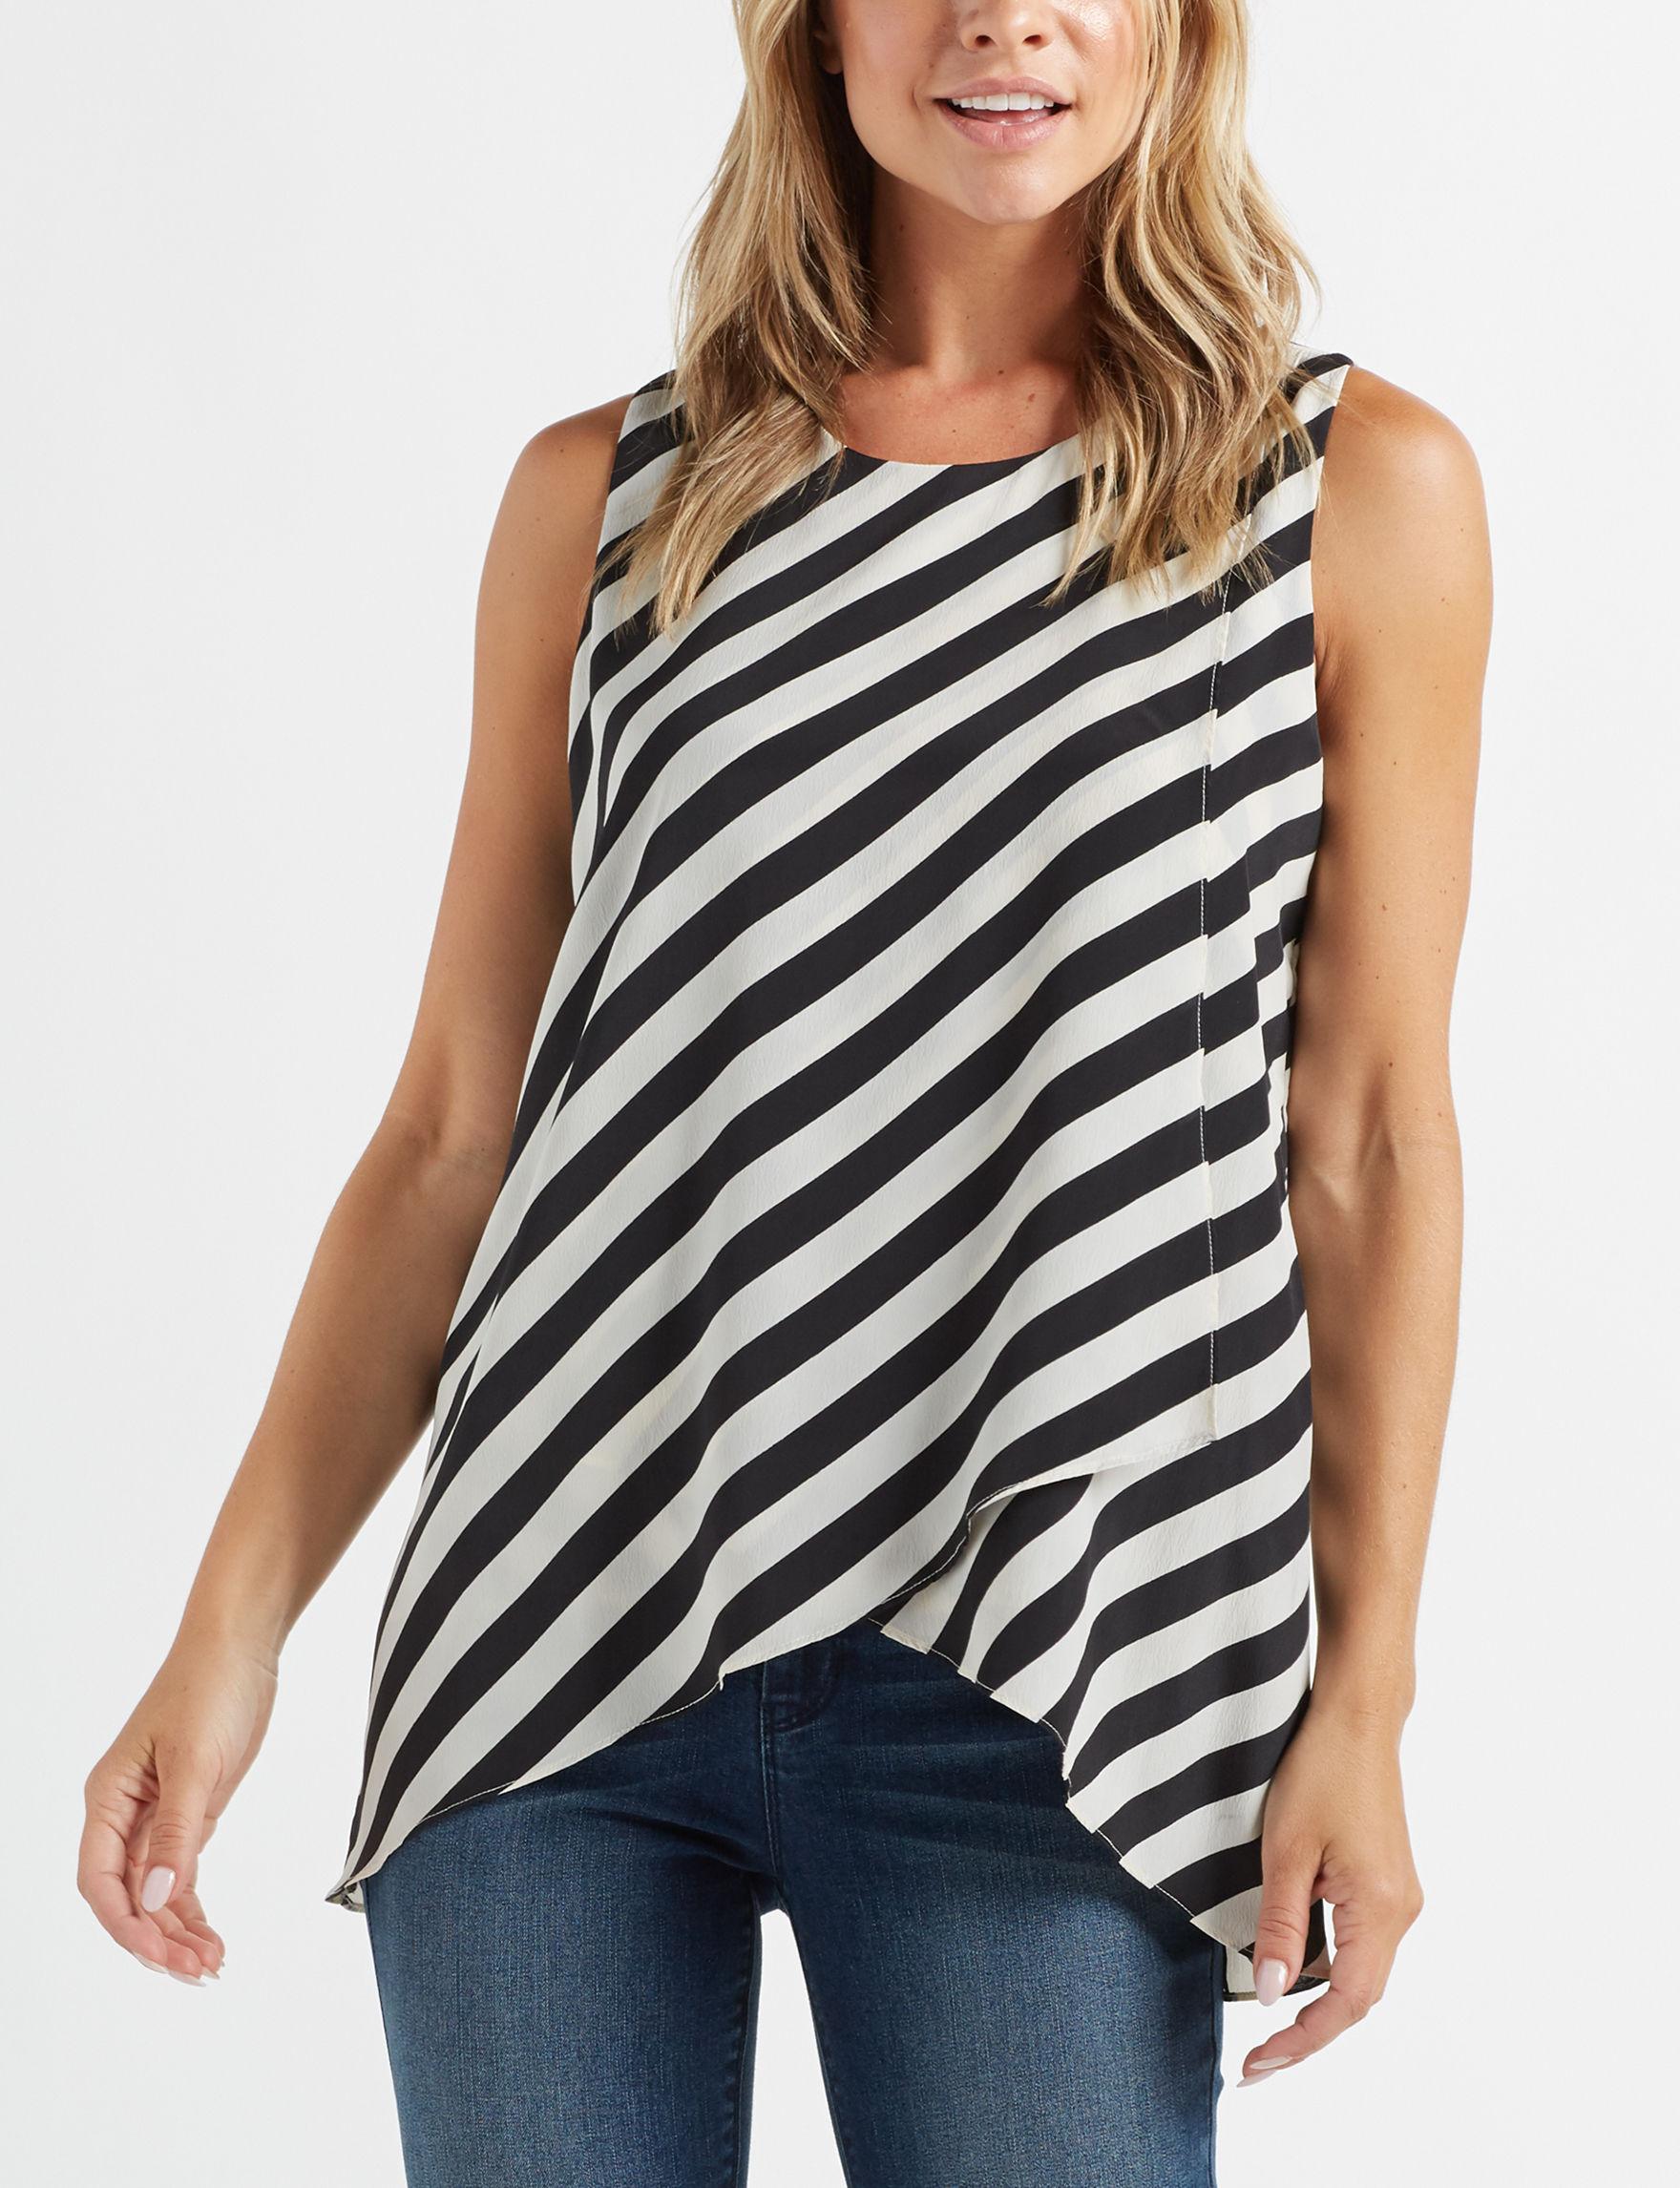 Zac & Rachel Ivory Shirts & Blouses